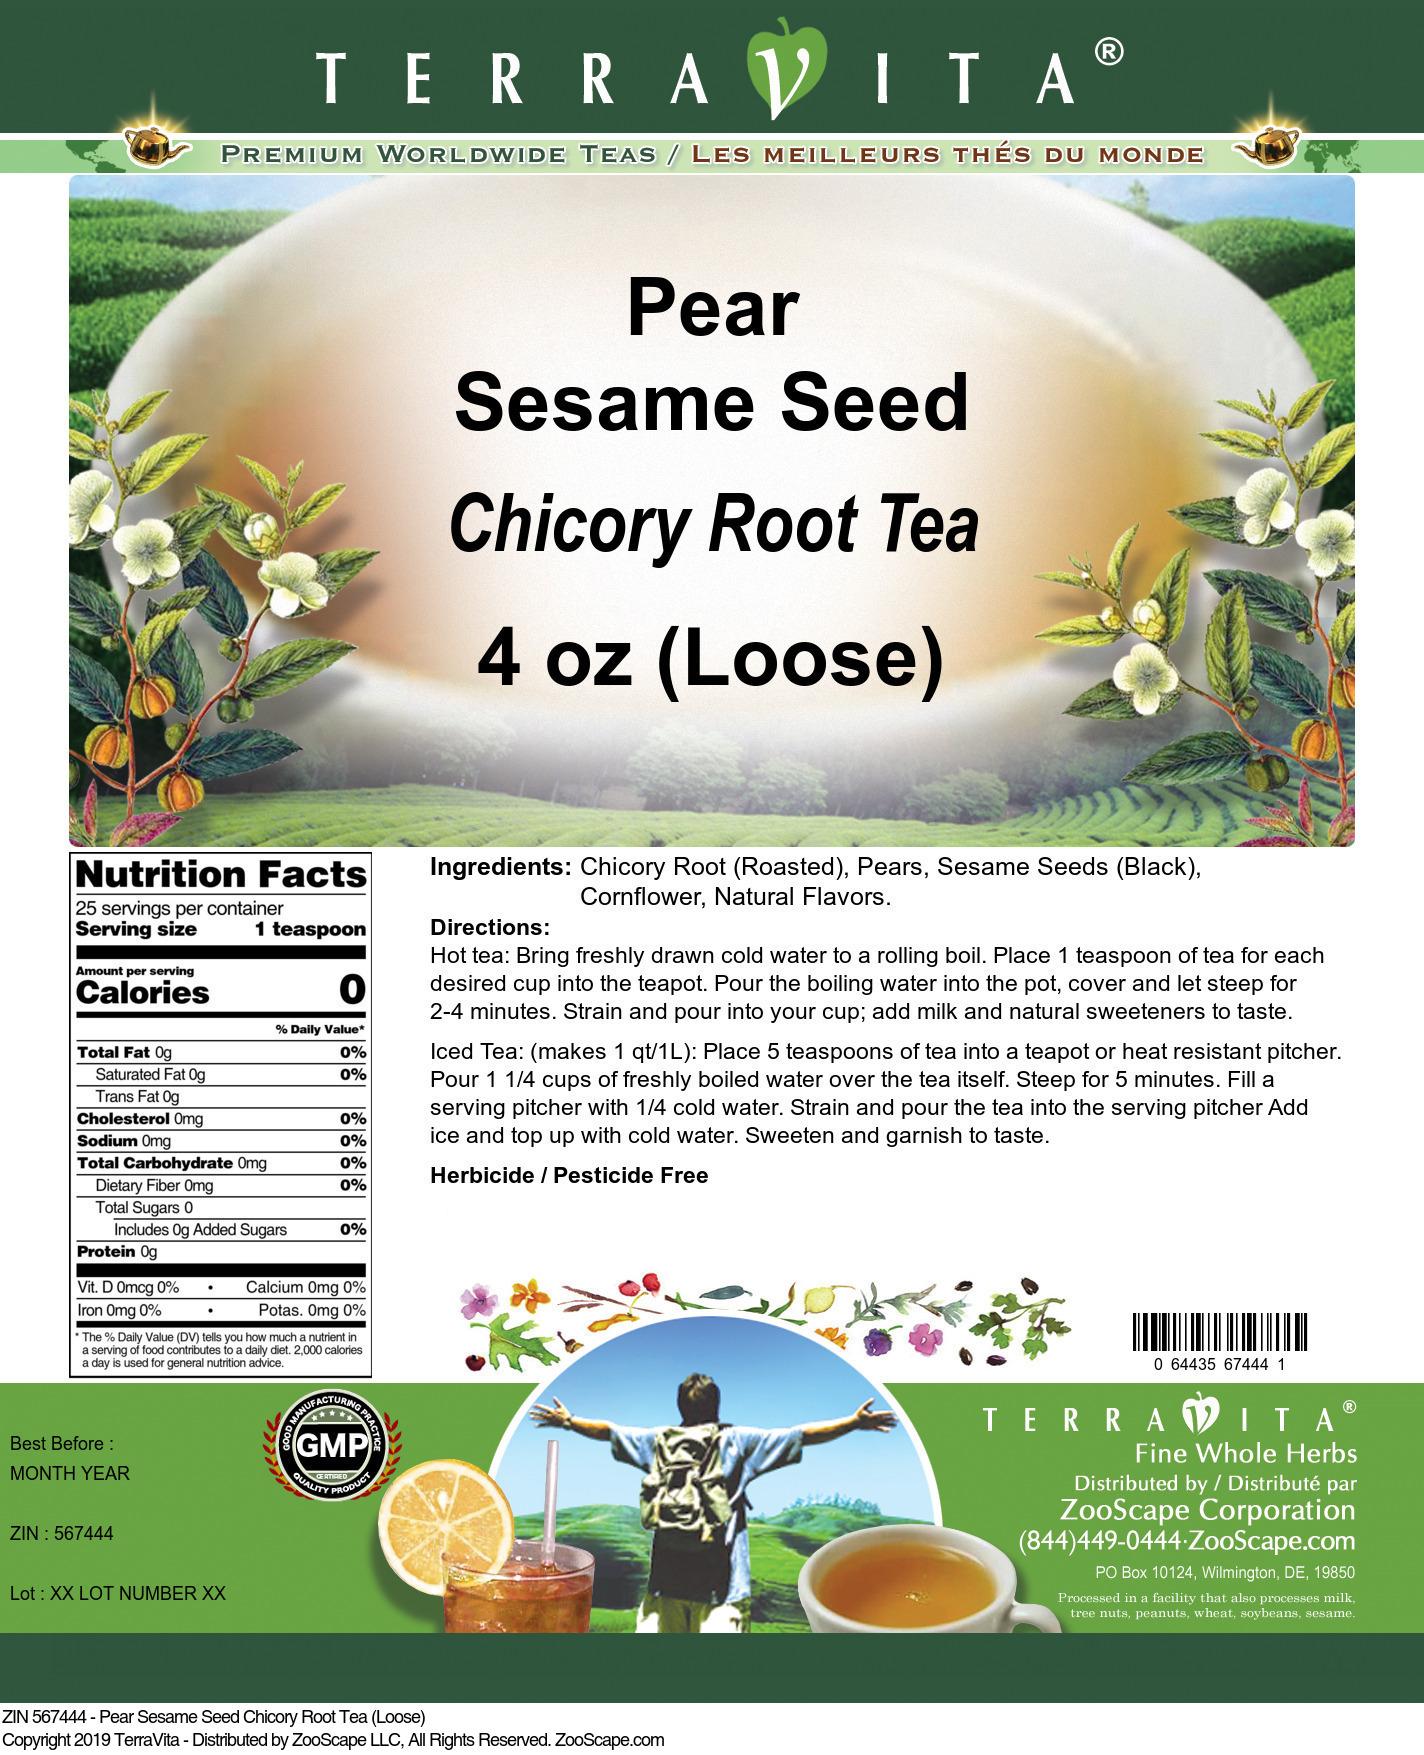 Pear Sesame Seed Chicory Root Tea (Loose)